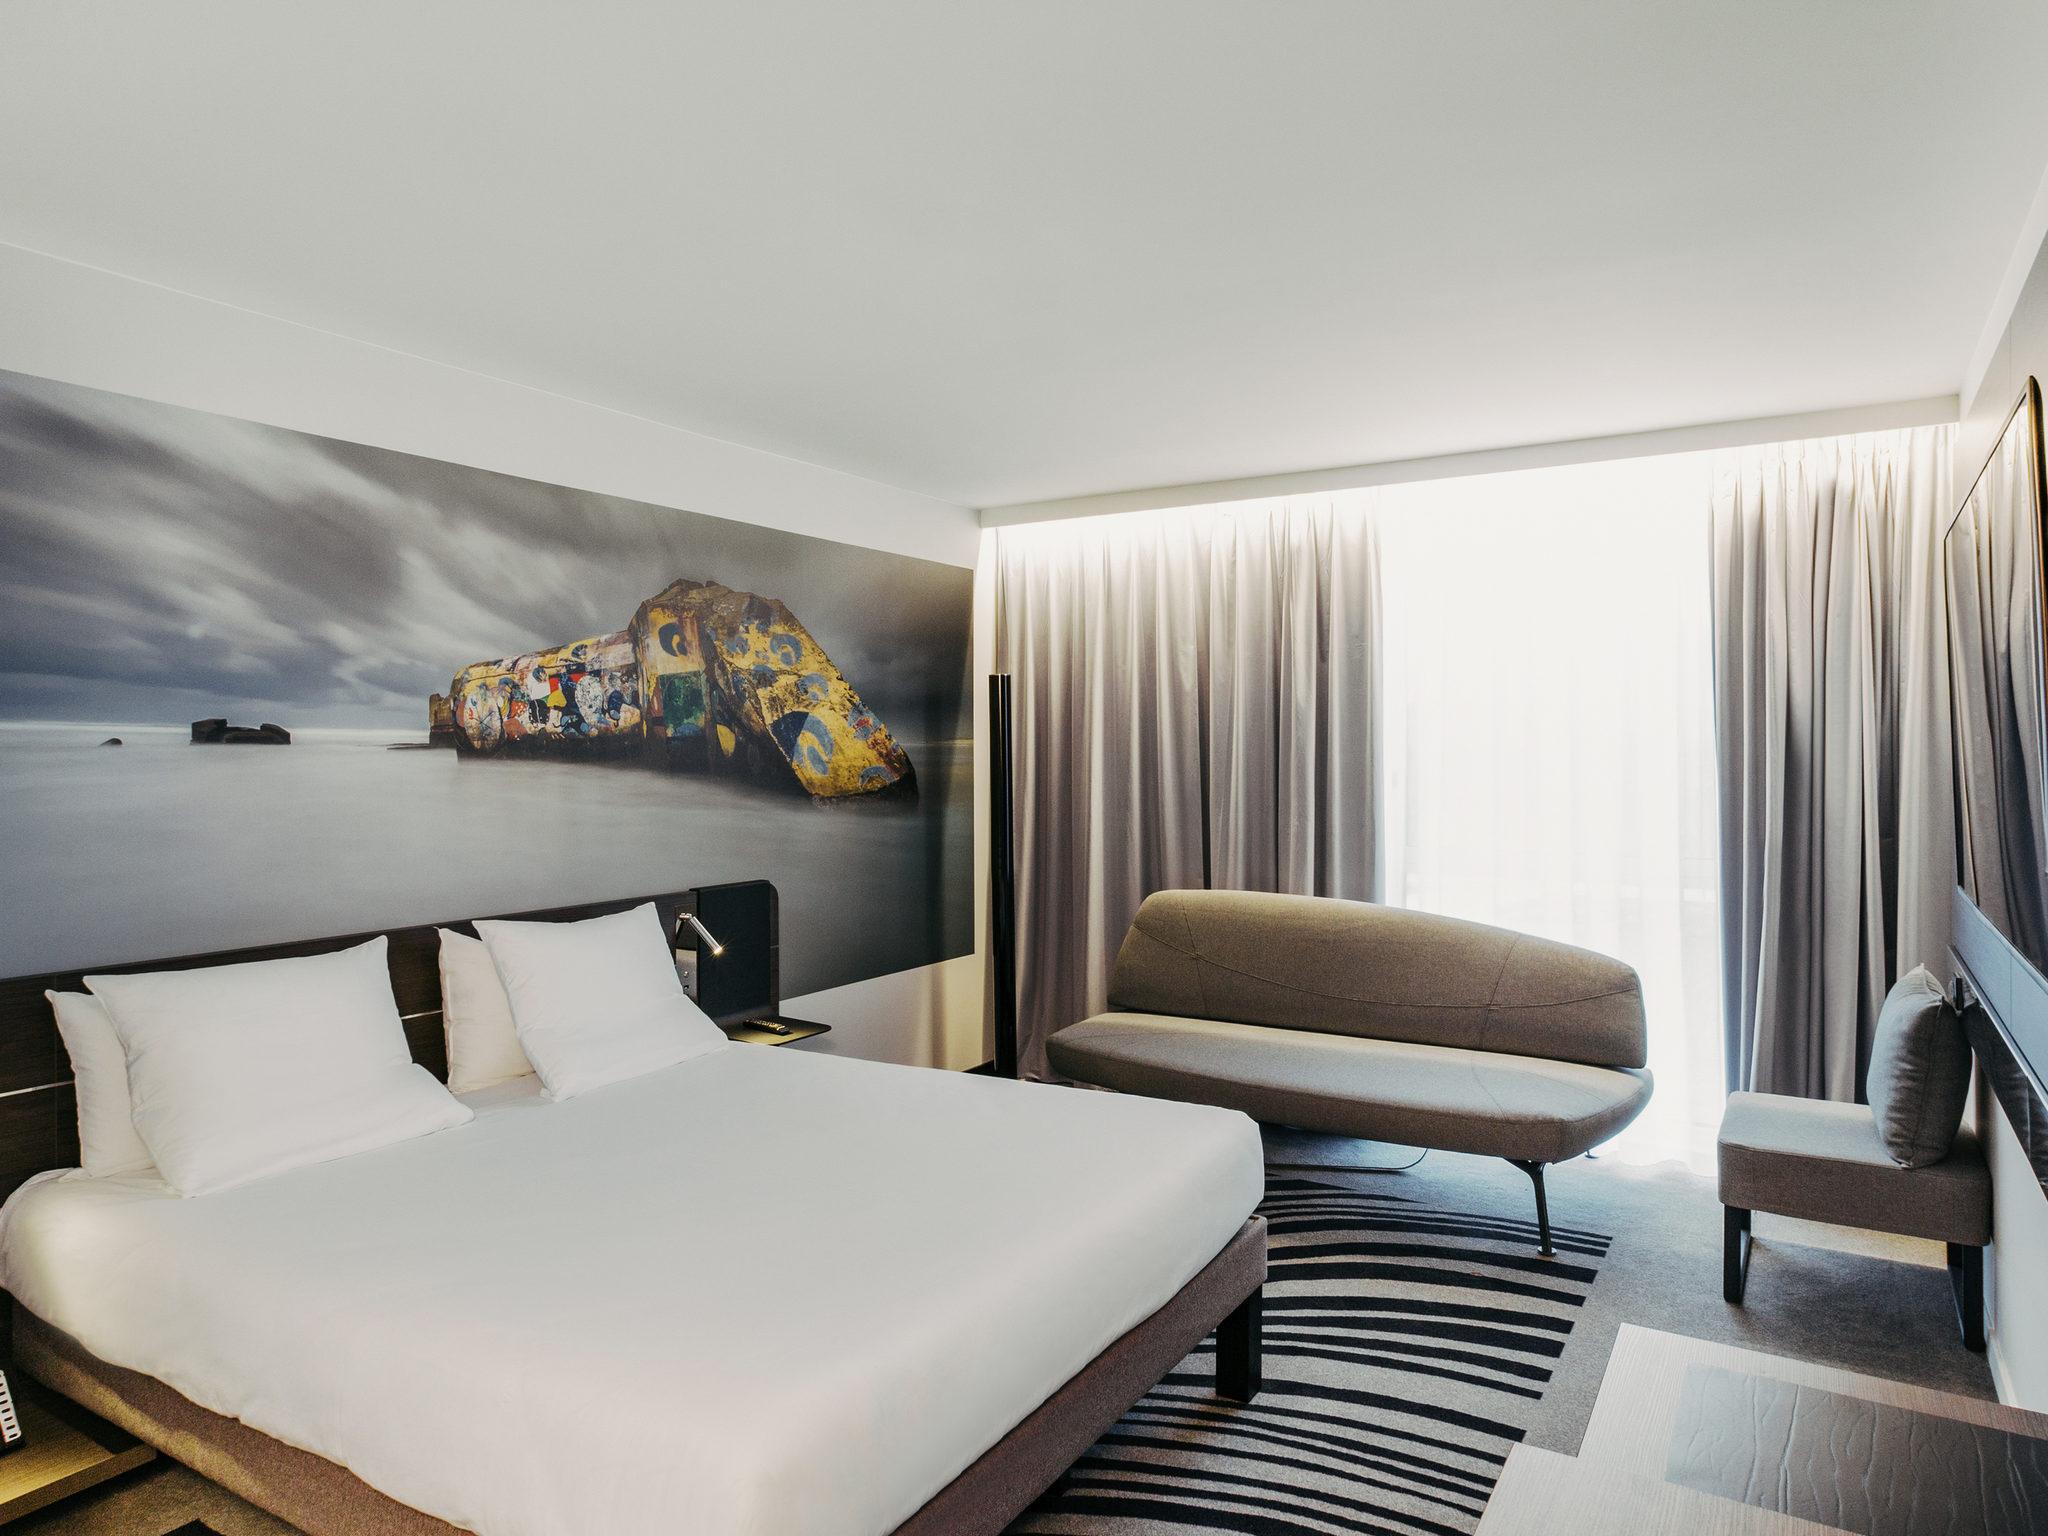 h tel orly novotel paris coeur d 39 orly airport. Black Bedroom Furniture Sets. Home Design Ideas